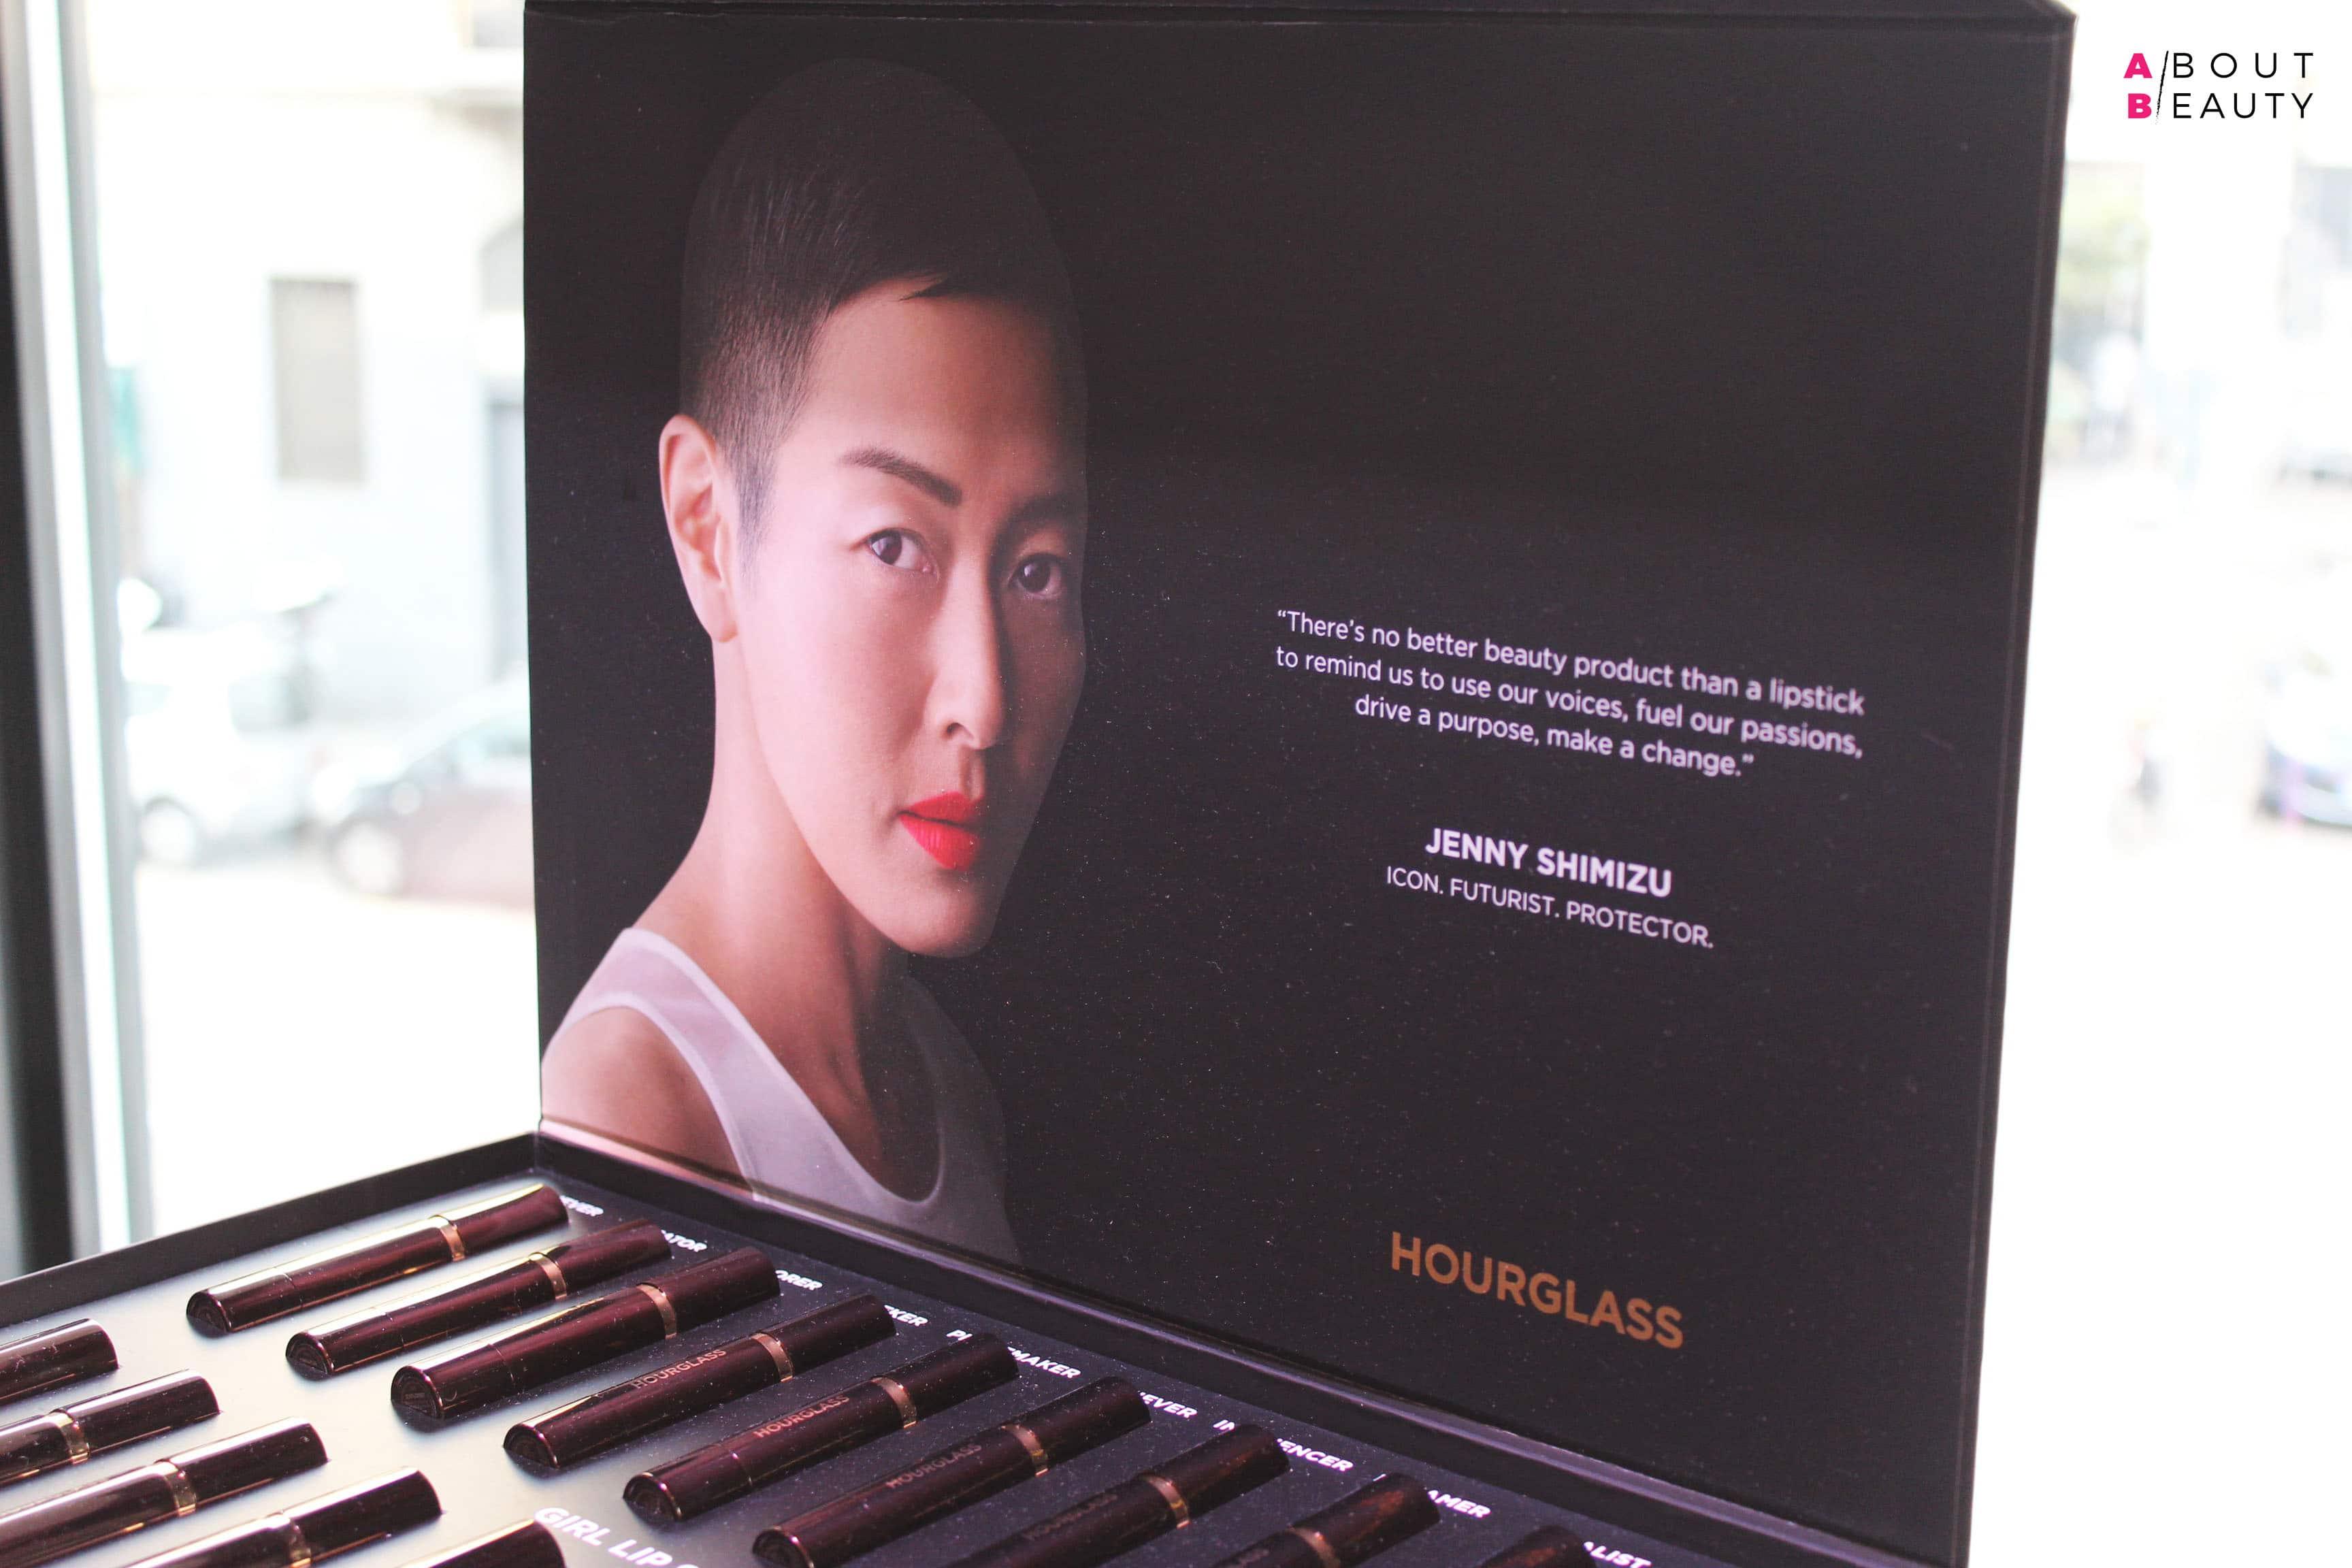 Hourglass presenta i nuovi rossetti Girl Lip Stylo in 20 tonalità - La testimonial Jenny Shimizu